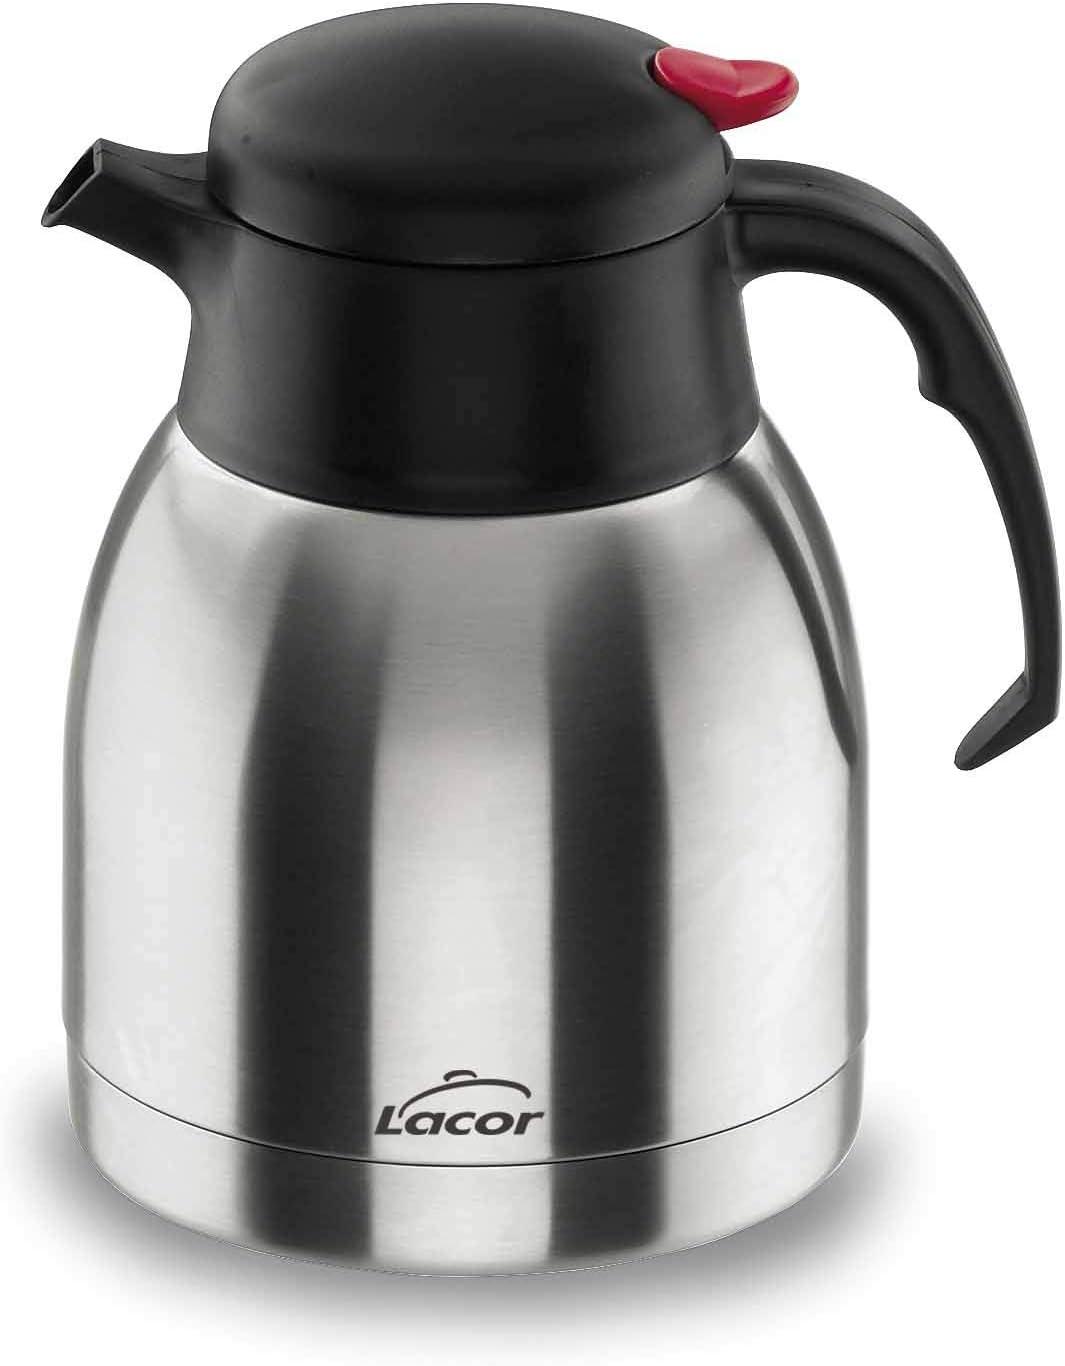 Lacor - 62486 - Servidor Termo 2 Litros: Amazon.es: Hogar